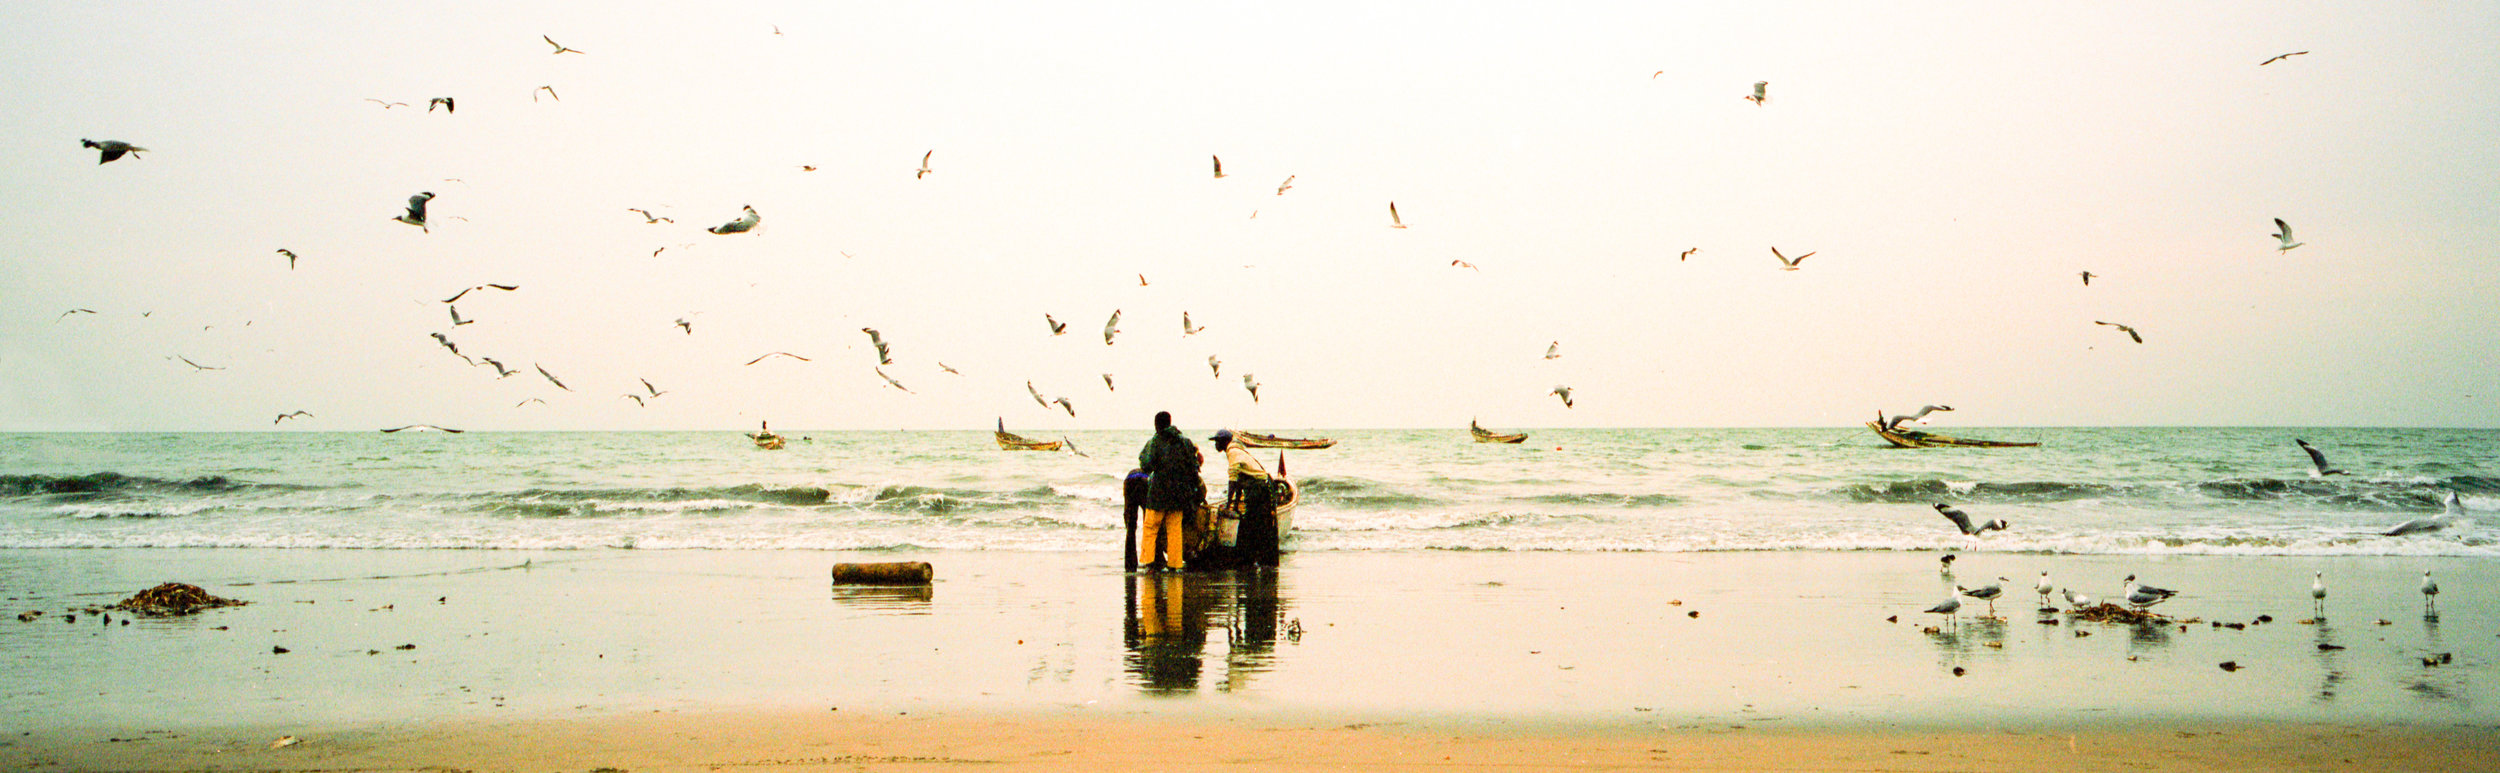 Landscape photography-17.jpg